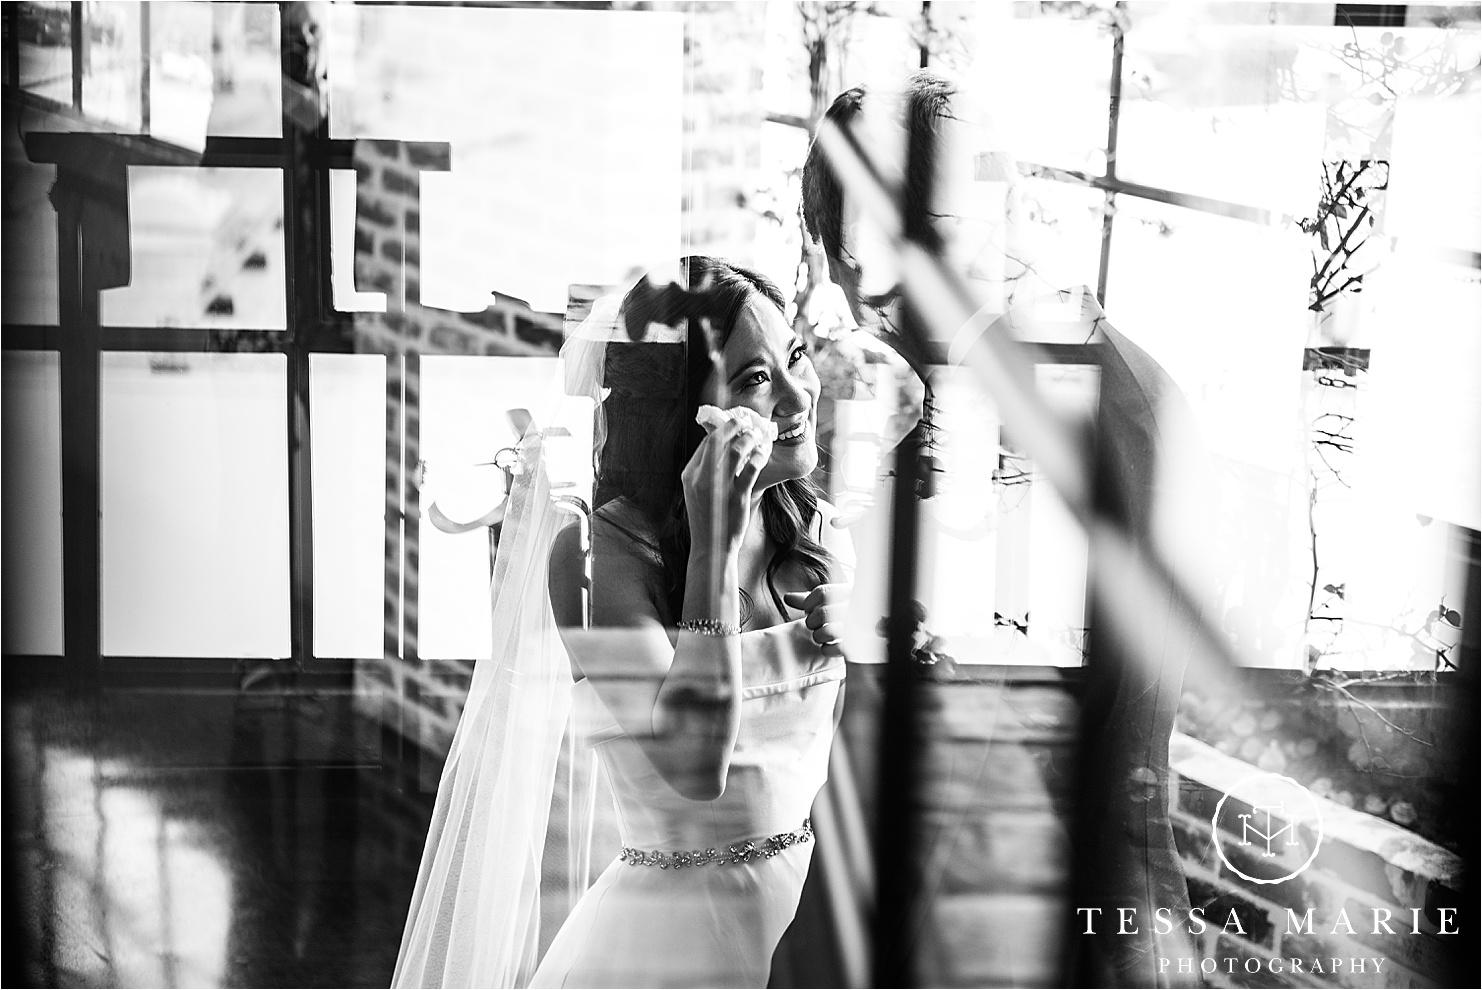 Tessa_marie_weddings_houston_wedding_photographer_The_astorian_0051.jpg